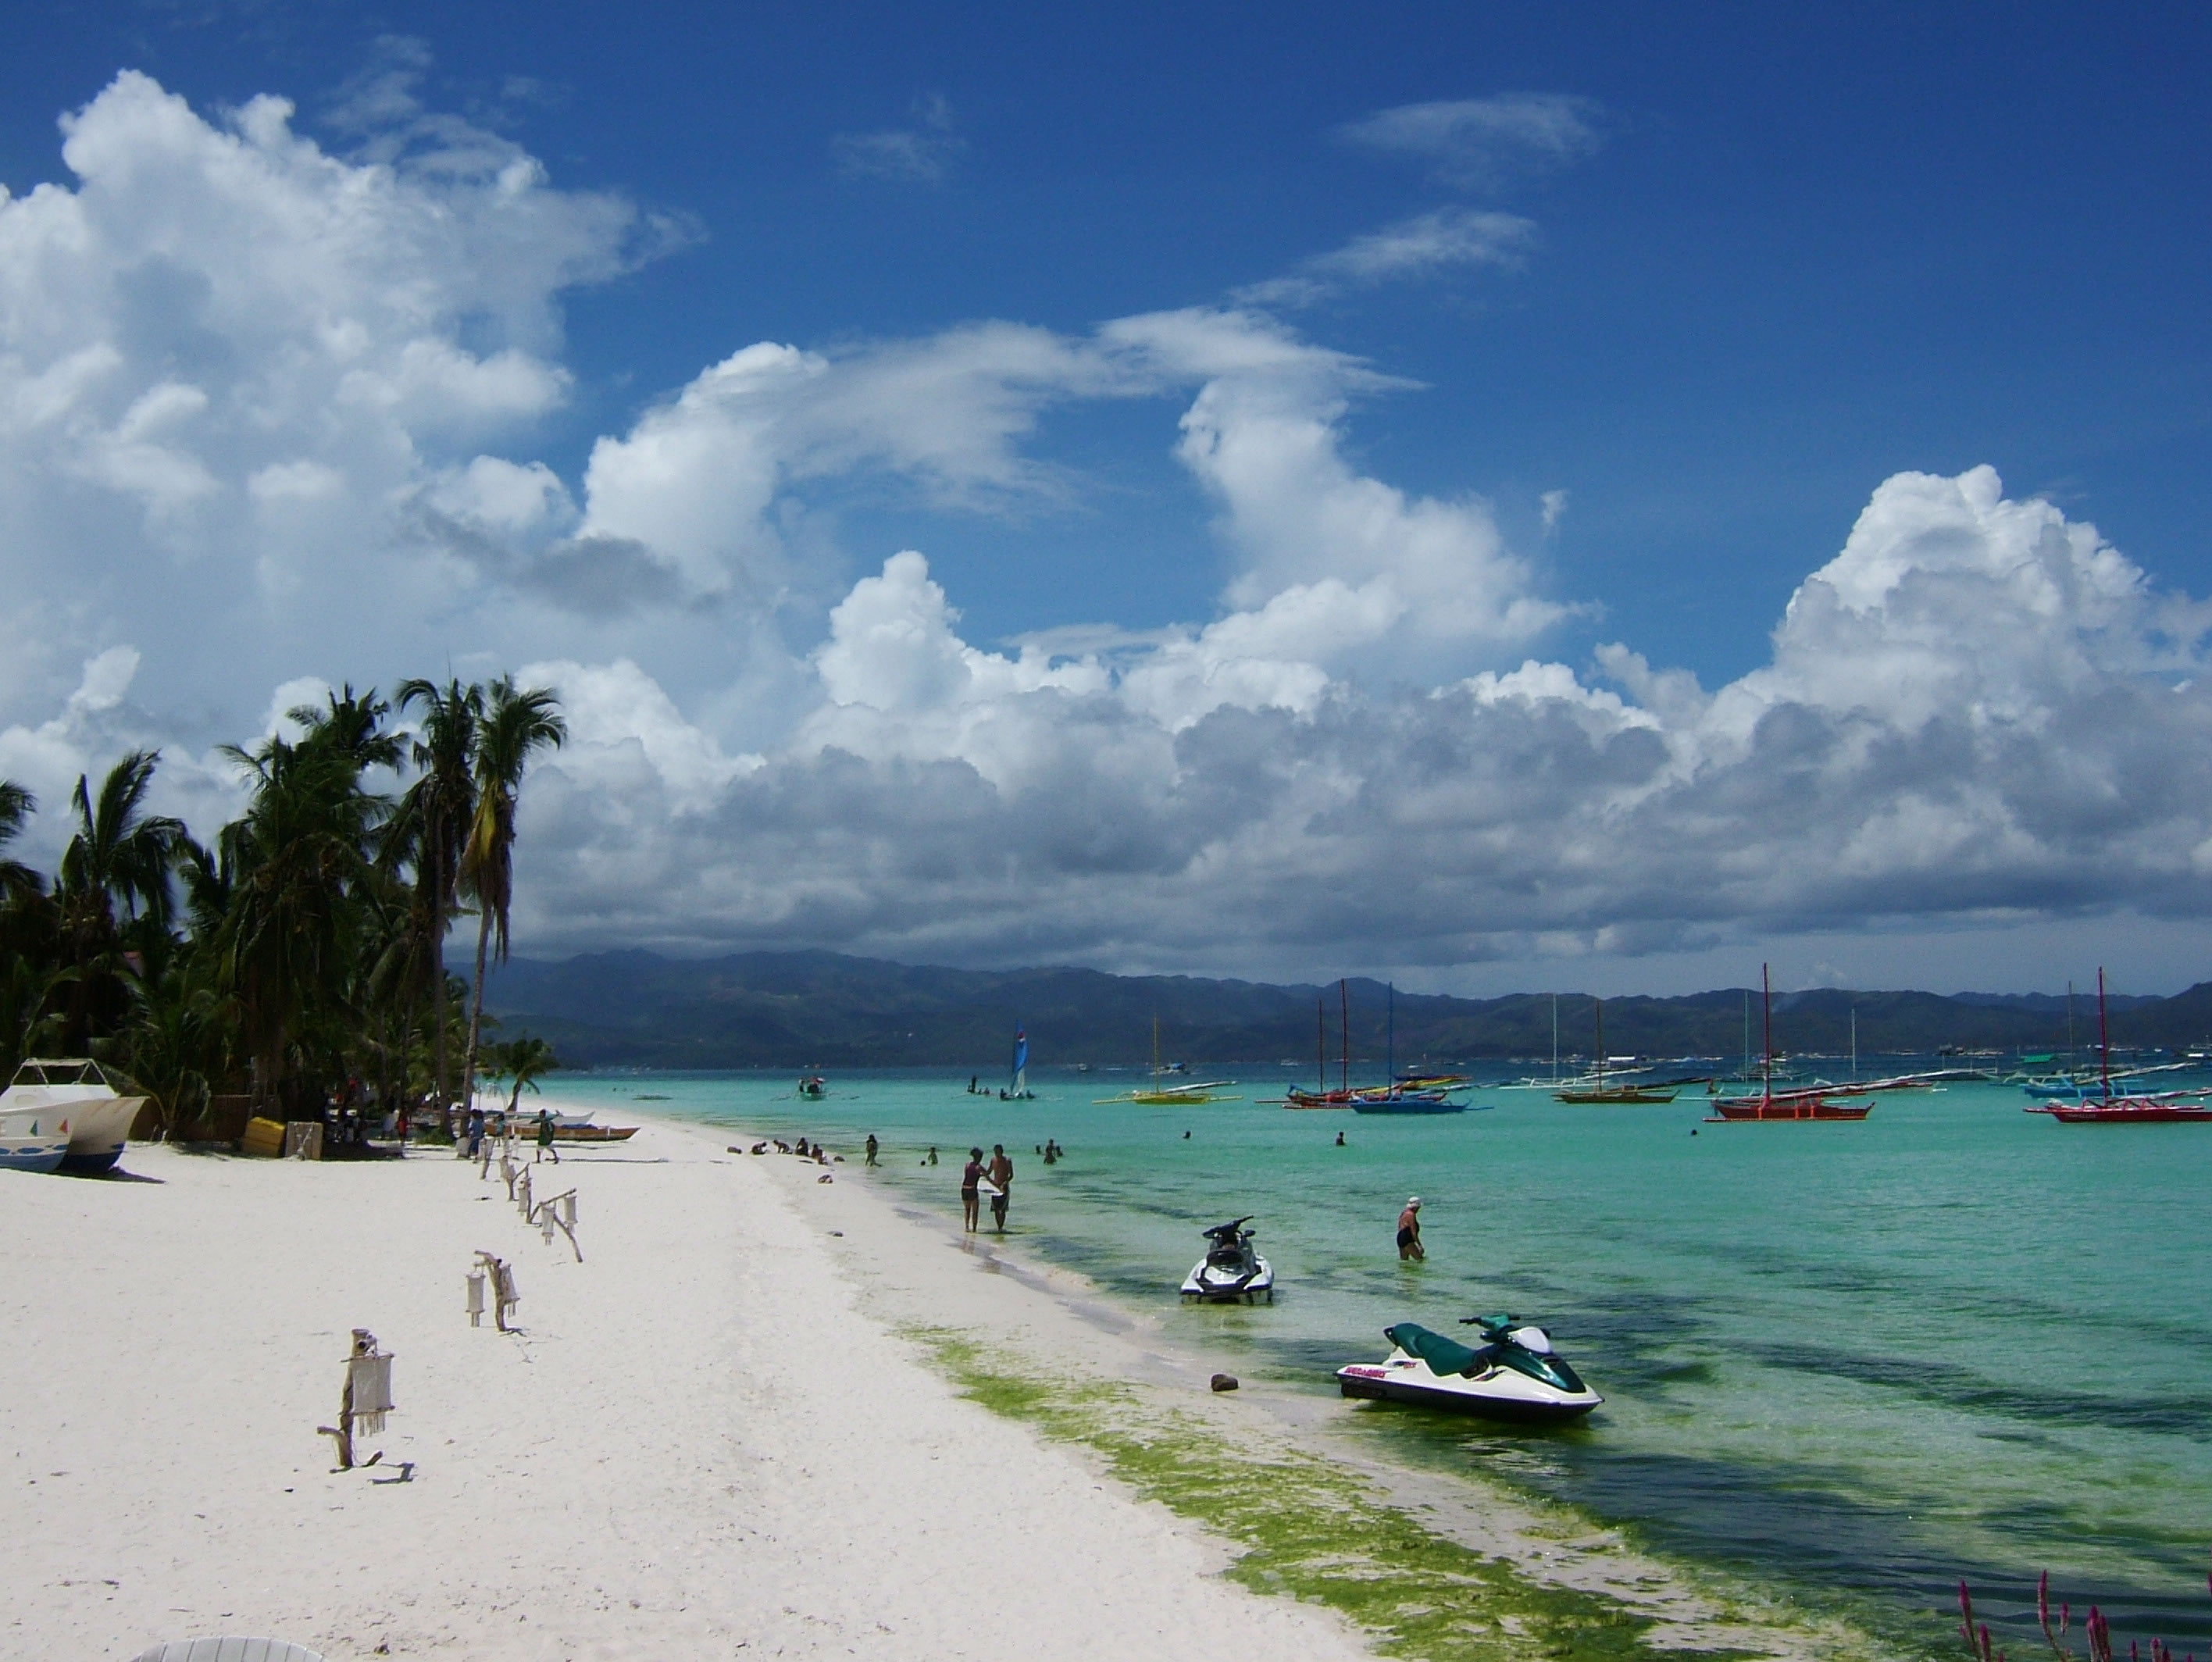 Green algae pollution Philippines Sugar Islands Boracay Punta bunga beach Resorts 2007 04